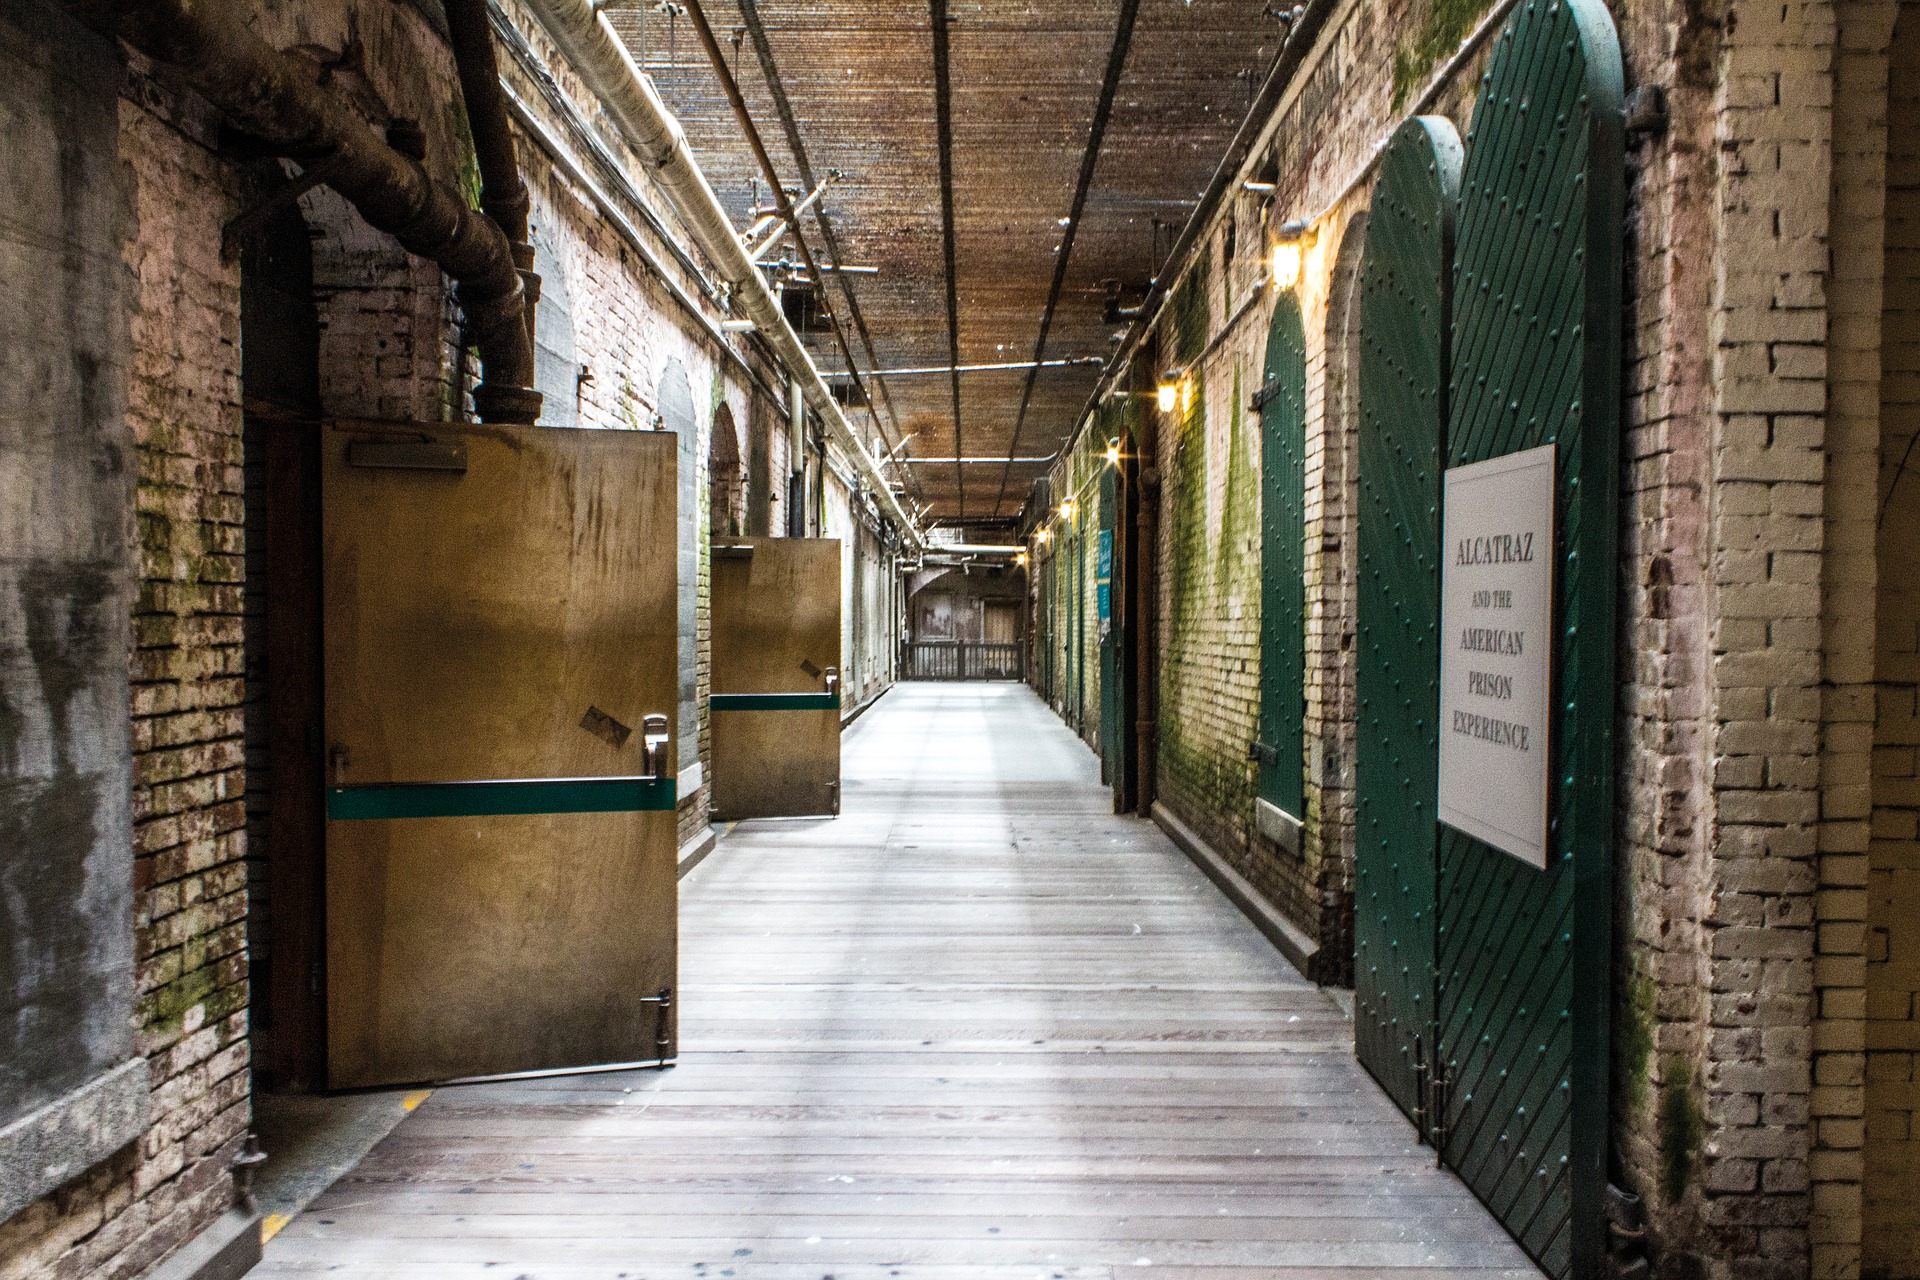 alcatraz-1630483_1920.jpg